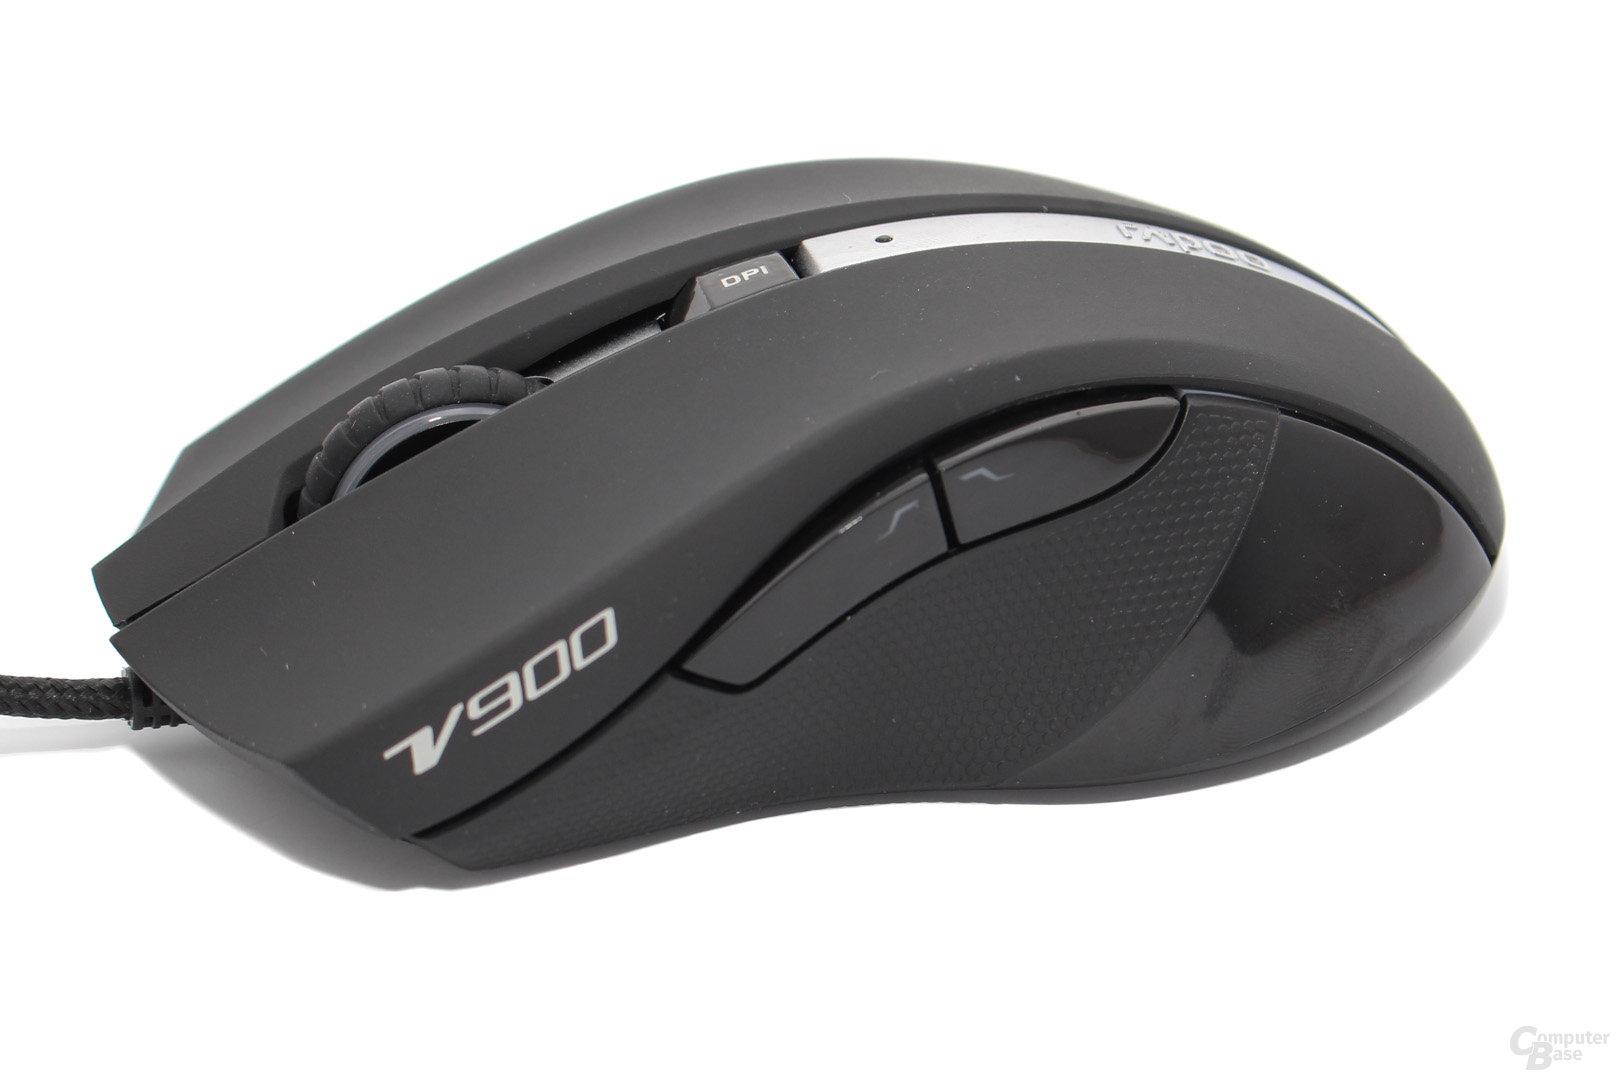 Vpro V900